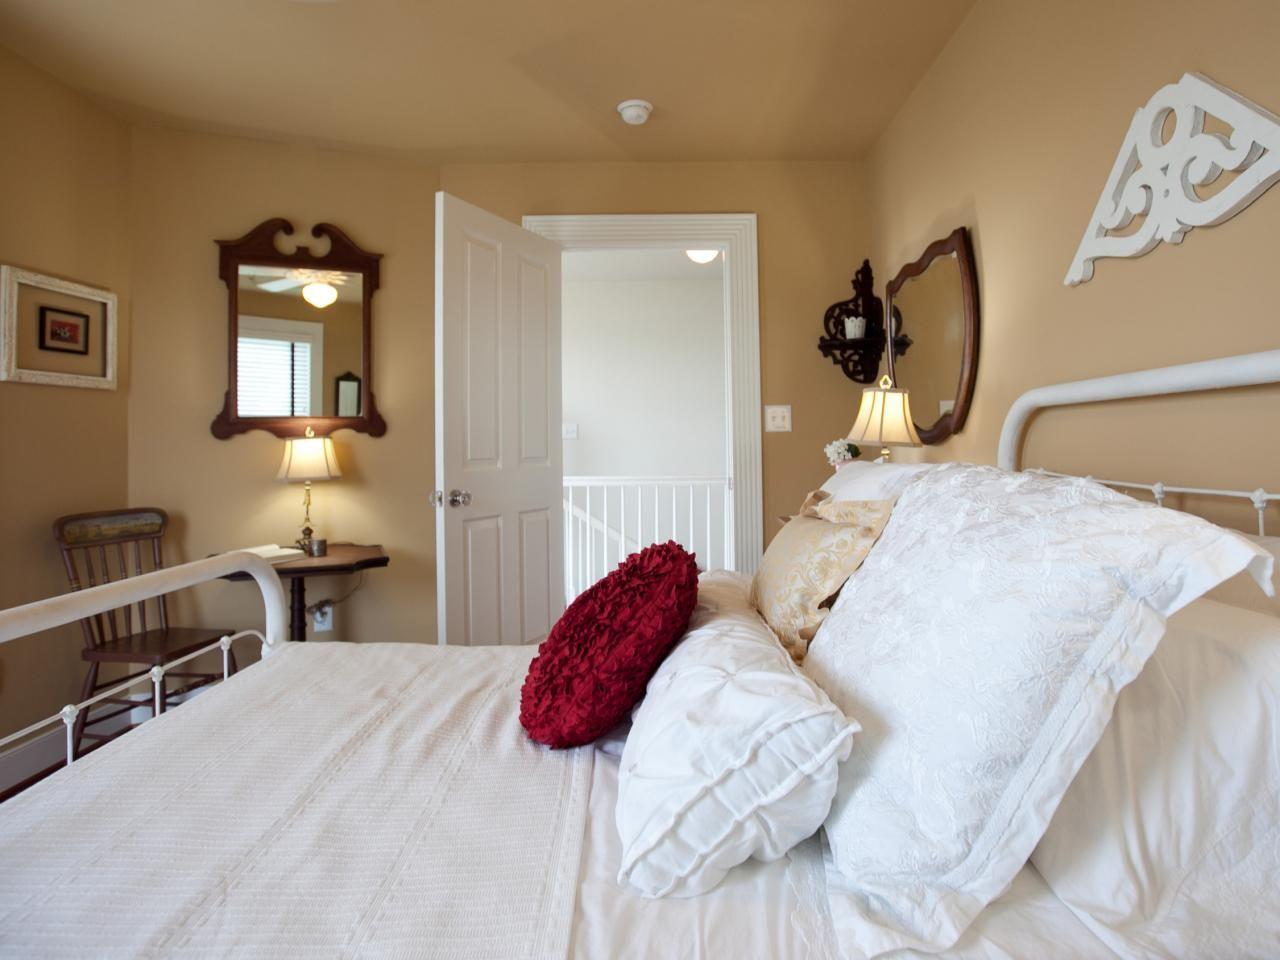 Which Bedroom is Your Favorite? | DIY Network Blog Cabin Giveaway | DIY